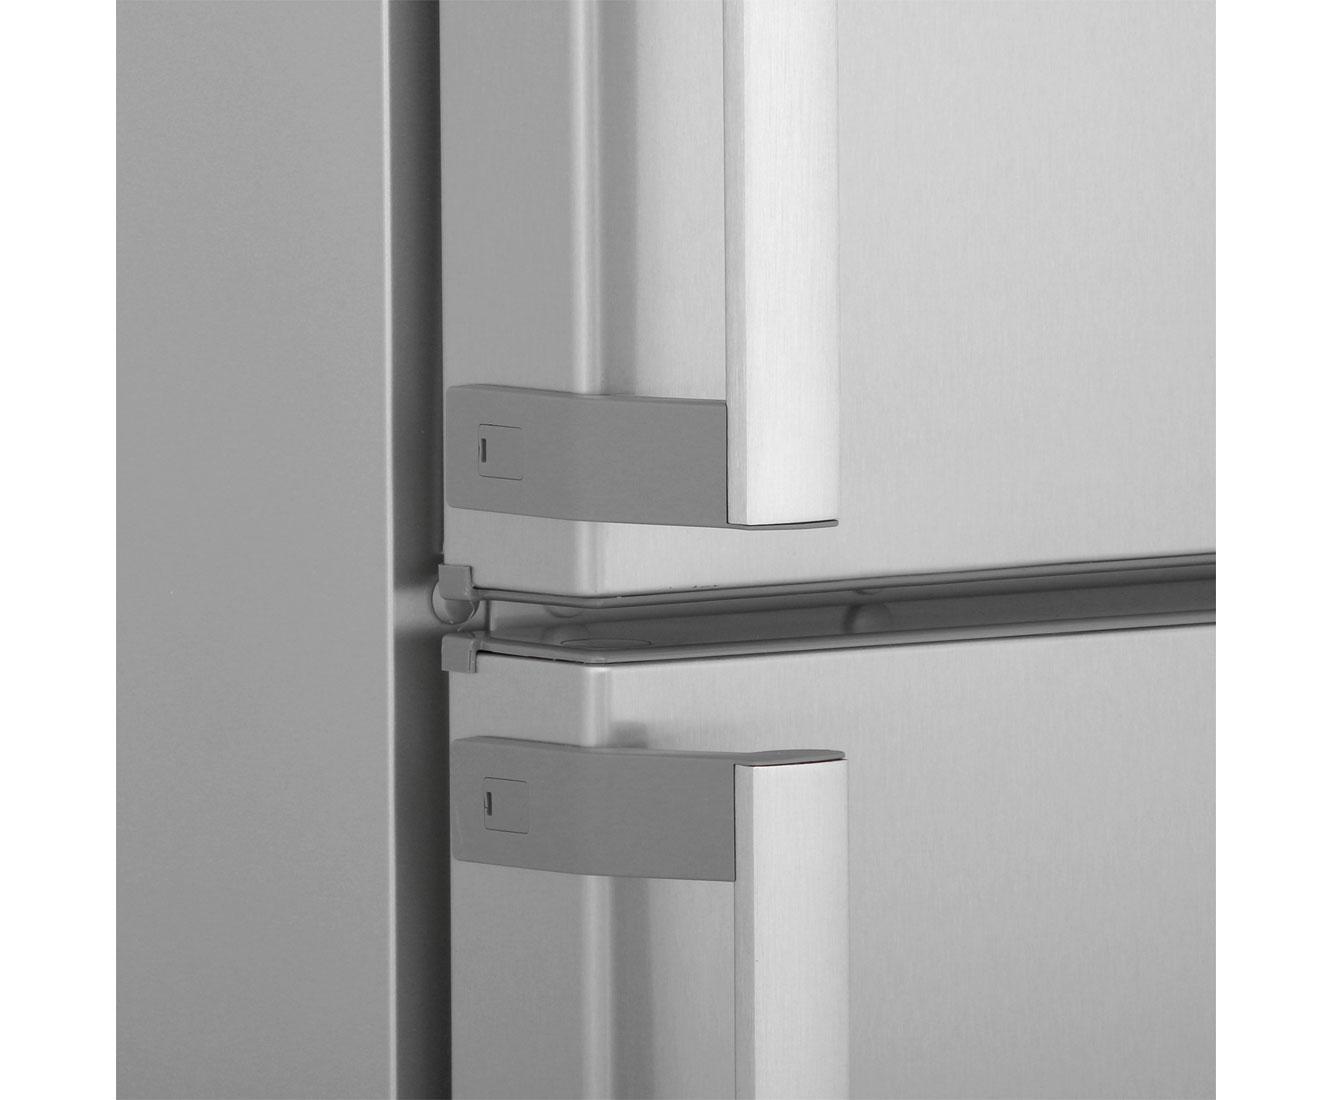 Smeg Kühlschrank Tür Quietscht : Kühlschrank scharnier quietscht kühlschrank scharniere quietschen